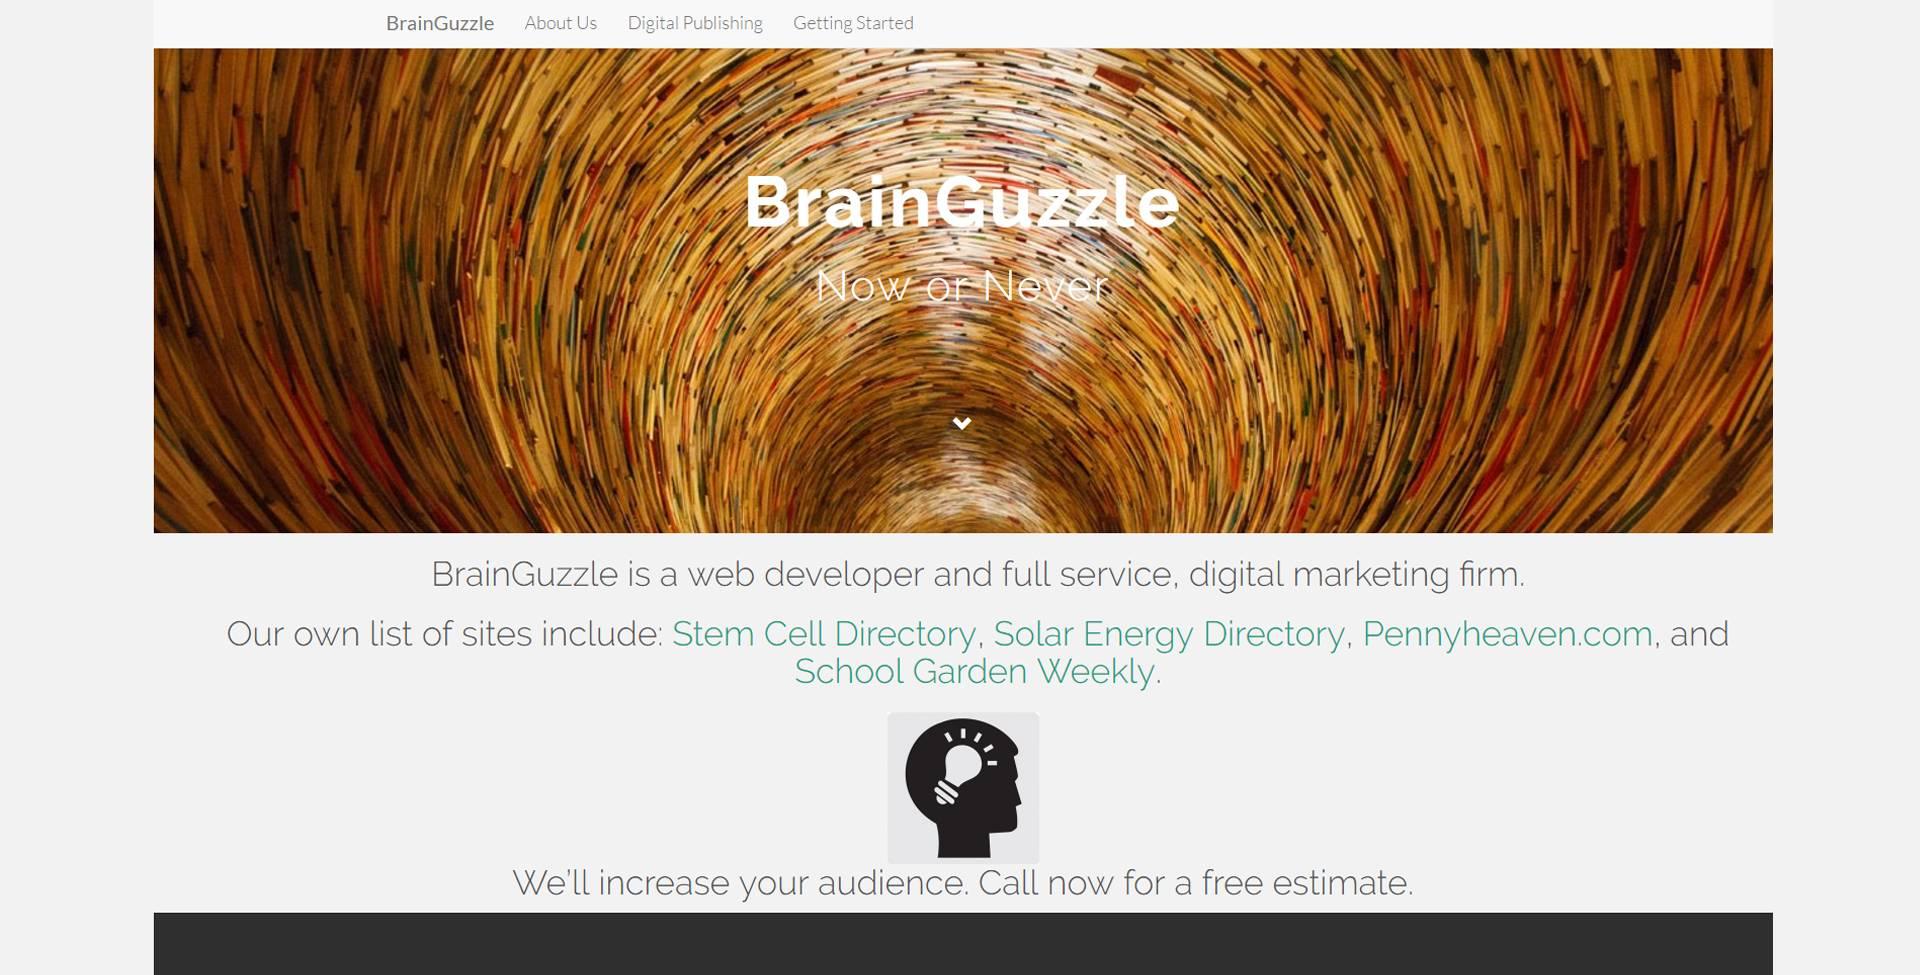 Brain Guzzle